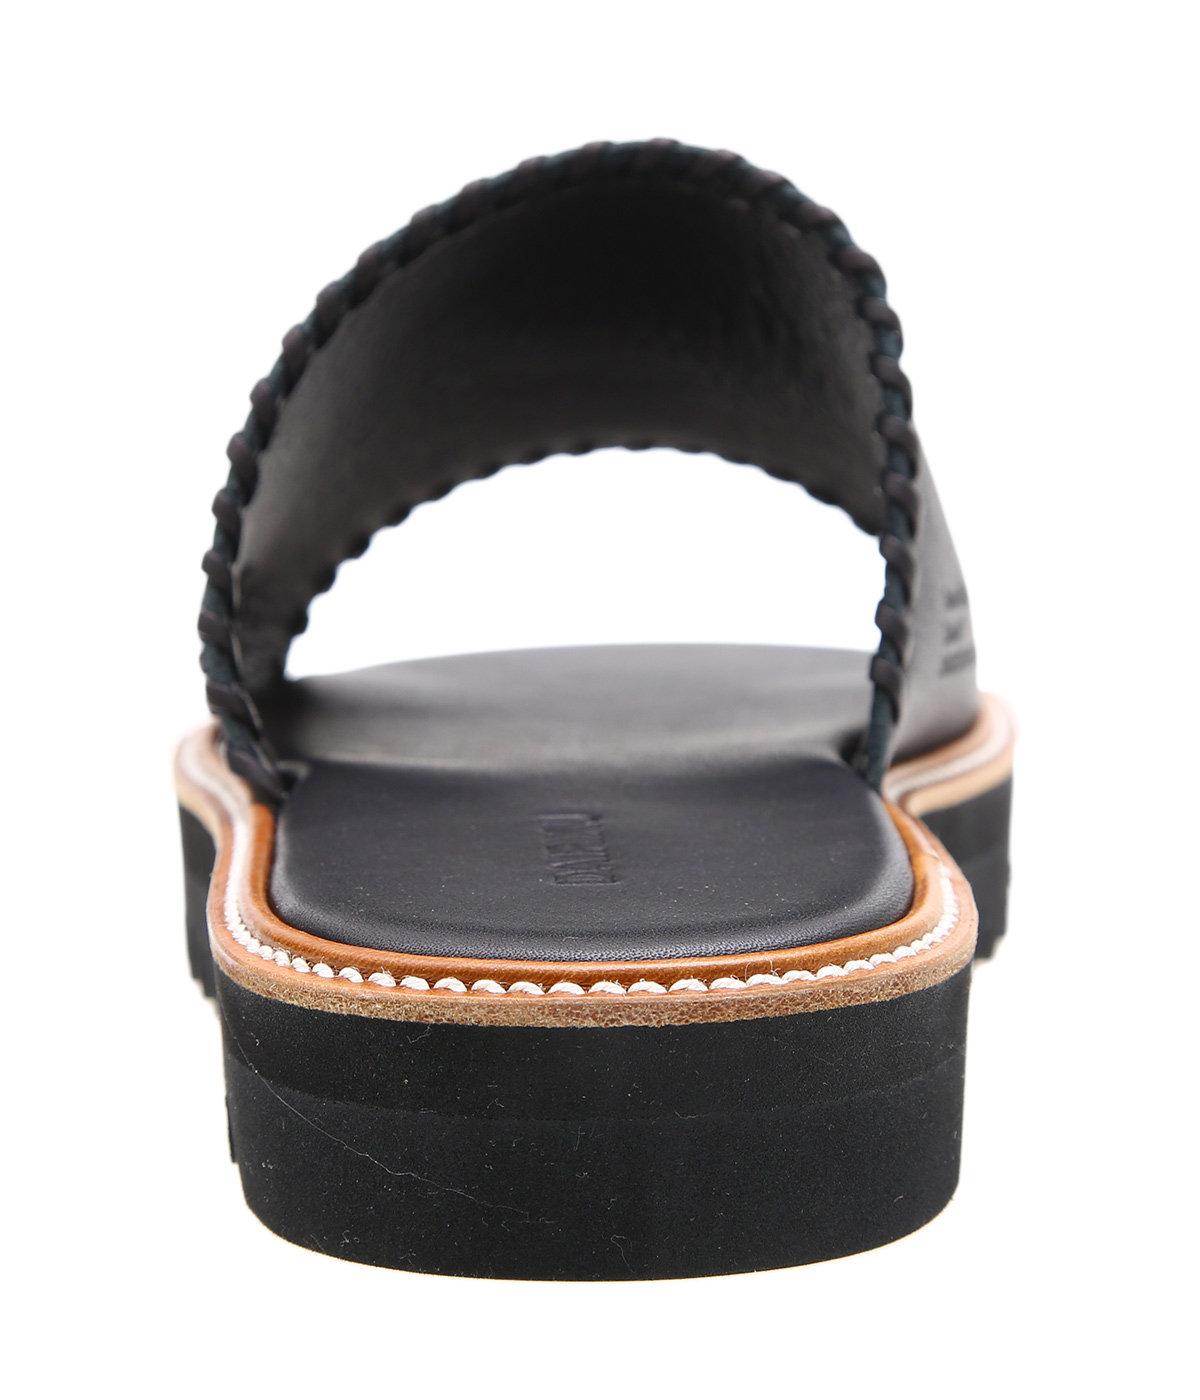 """Wyatt"" Hand Stitch Leather Sandal"